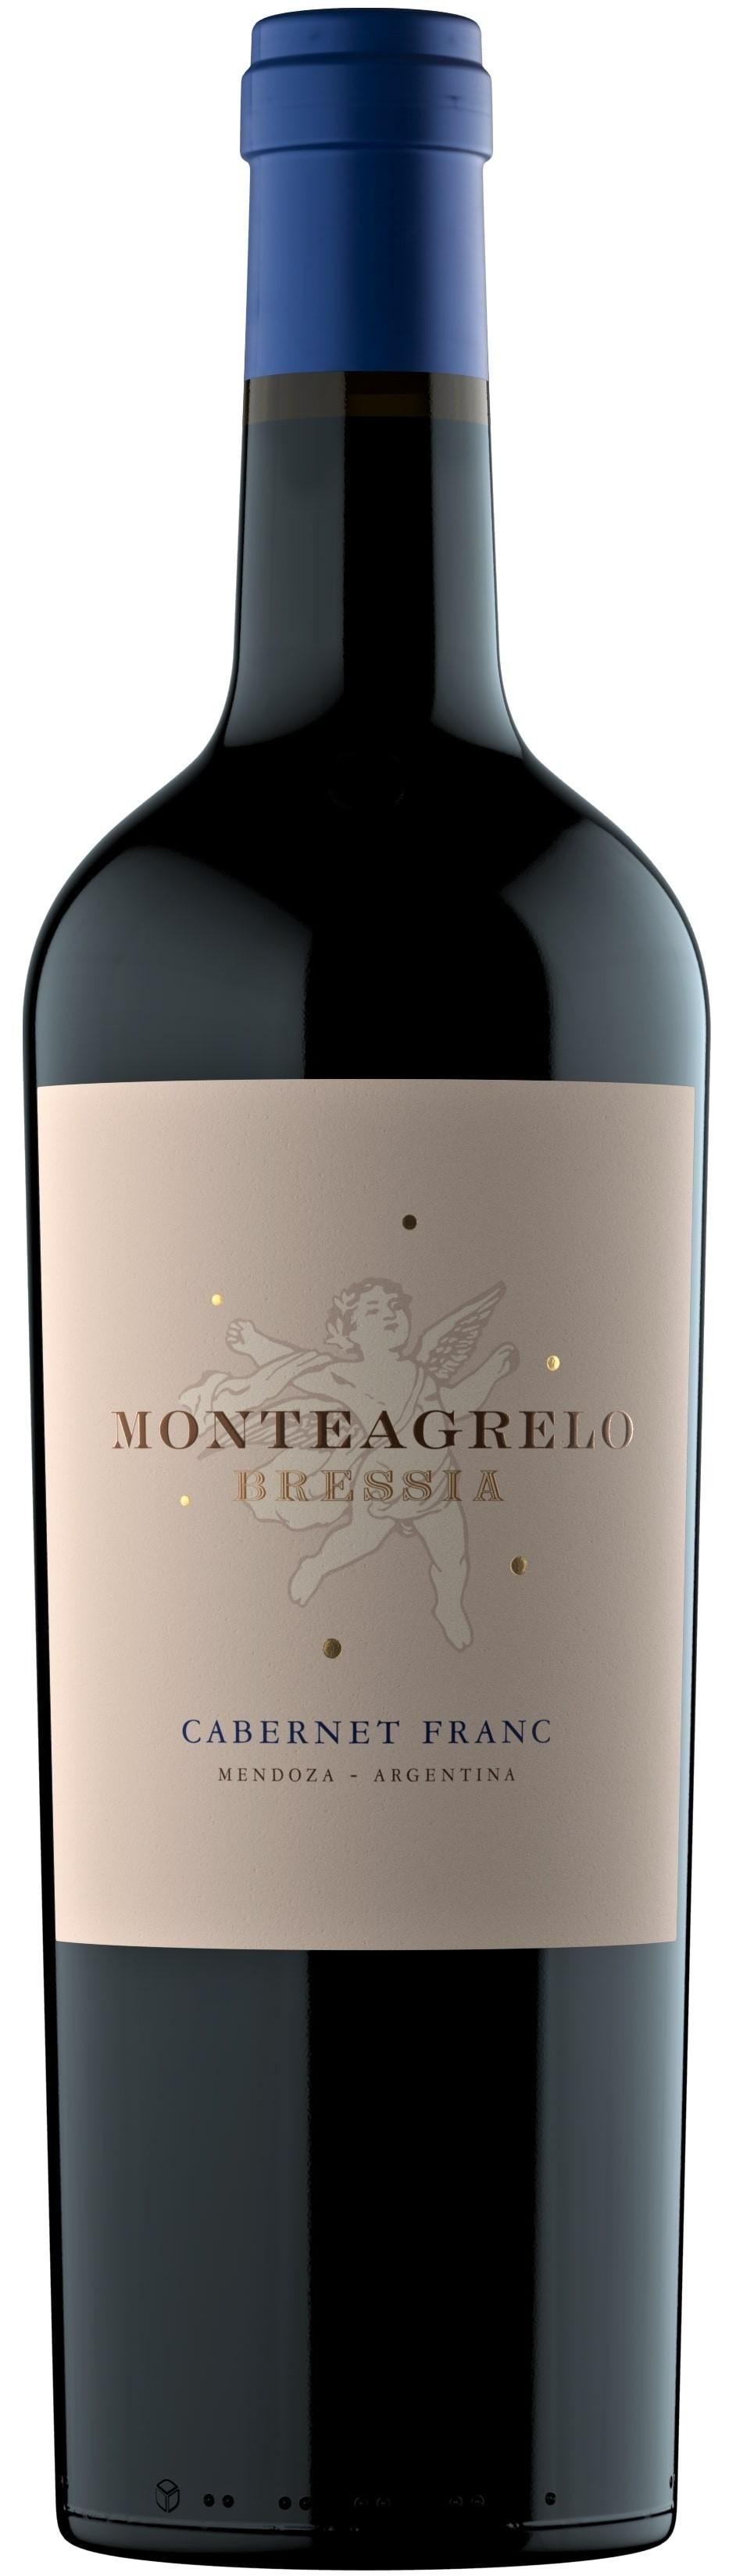 Bressia - Monteagrelo - Argentina - 2018